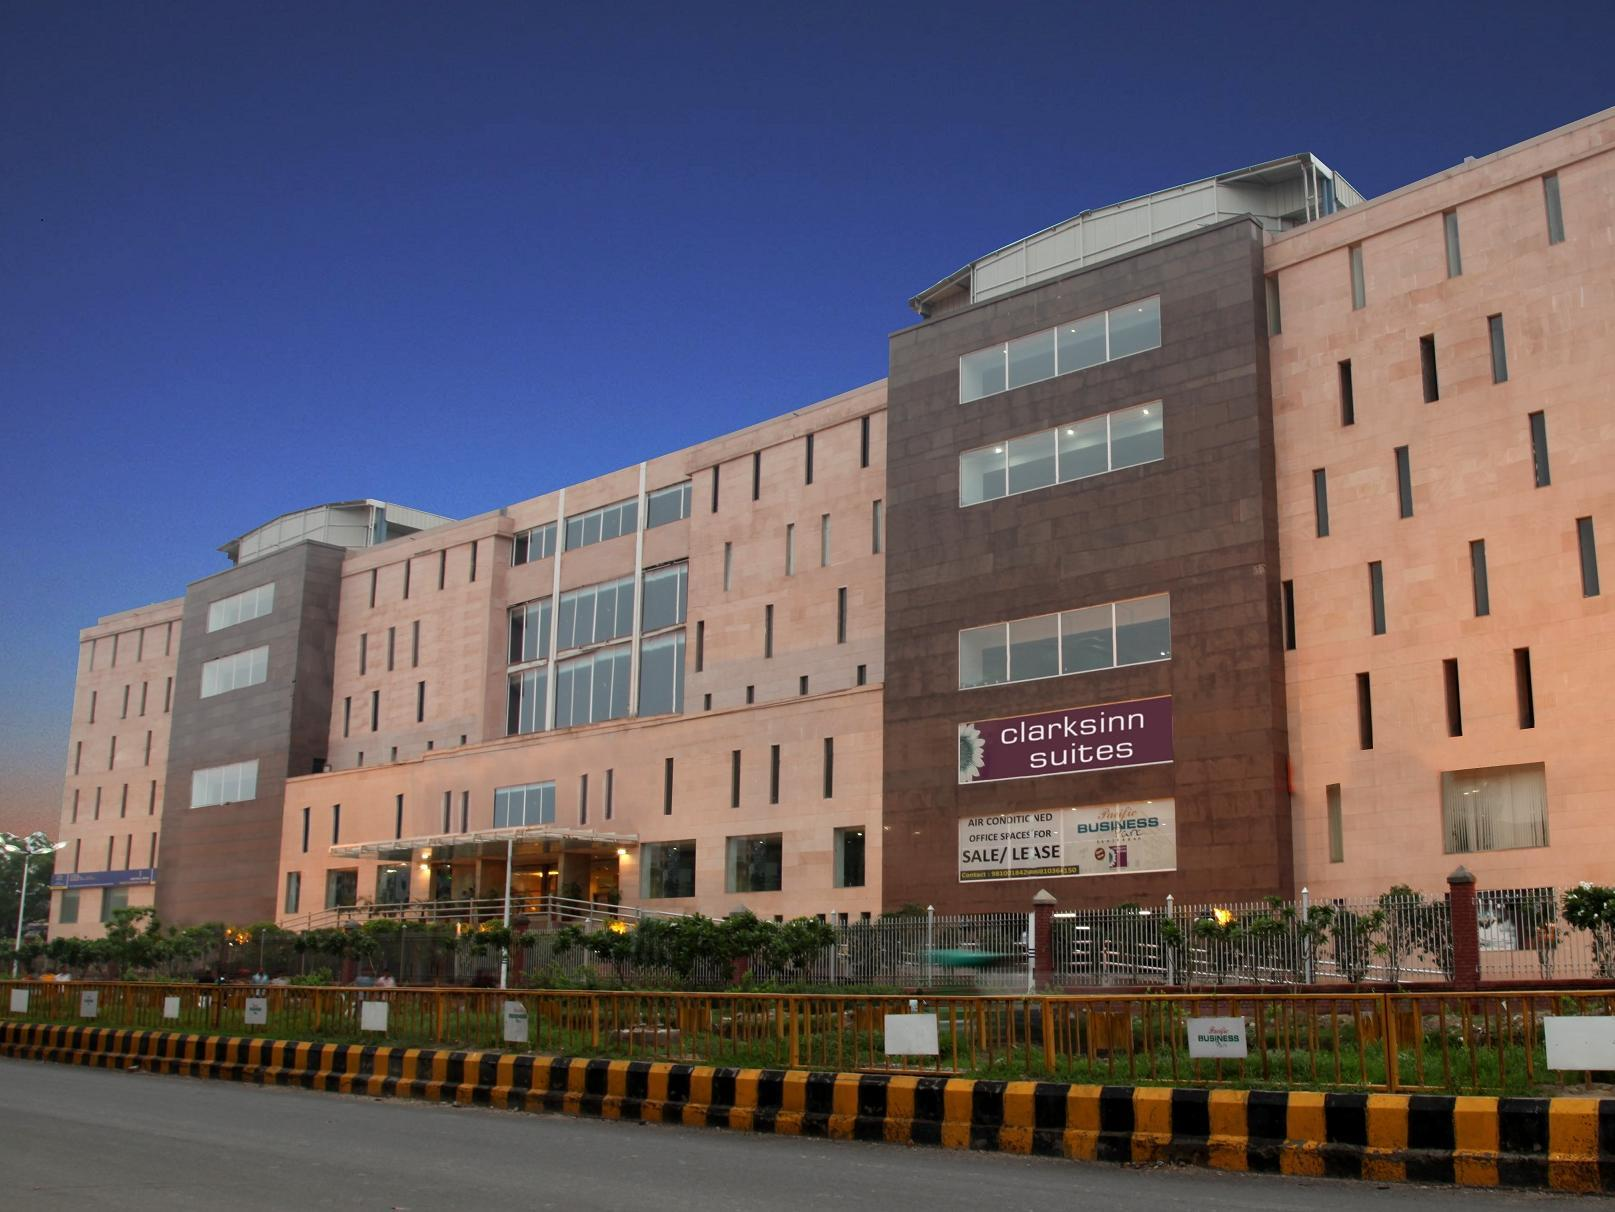 Clarks Inn Suites - Delhi NCR, Gautam Buddha Nagar